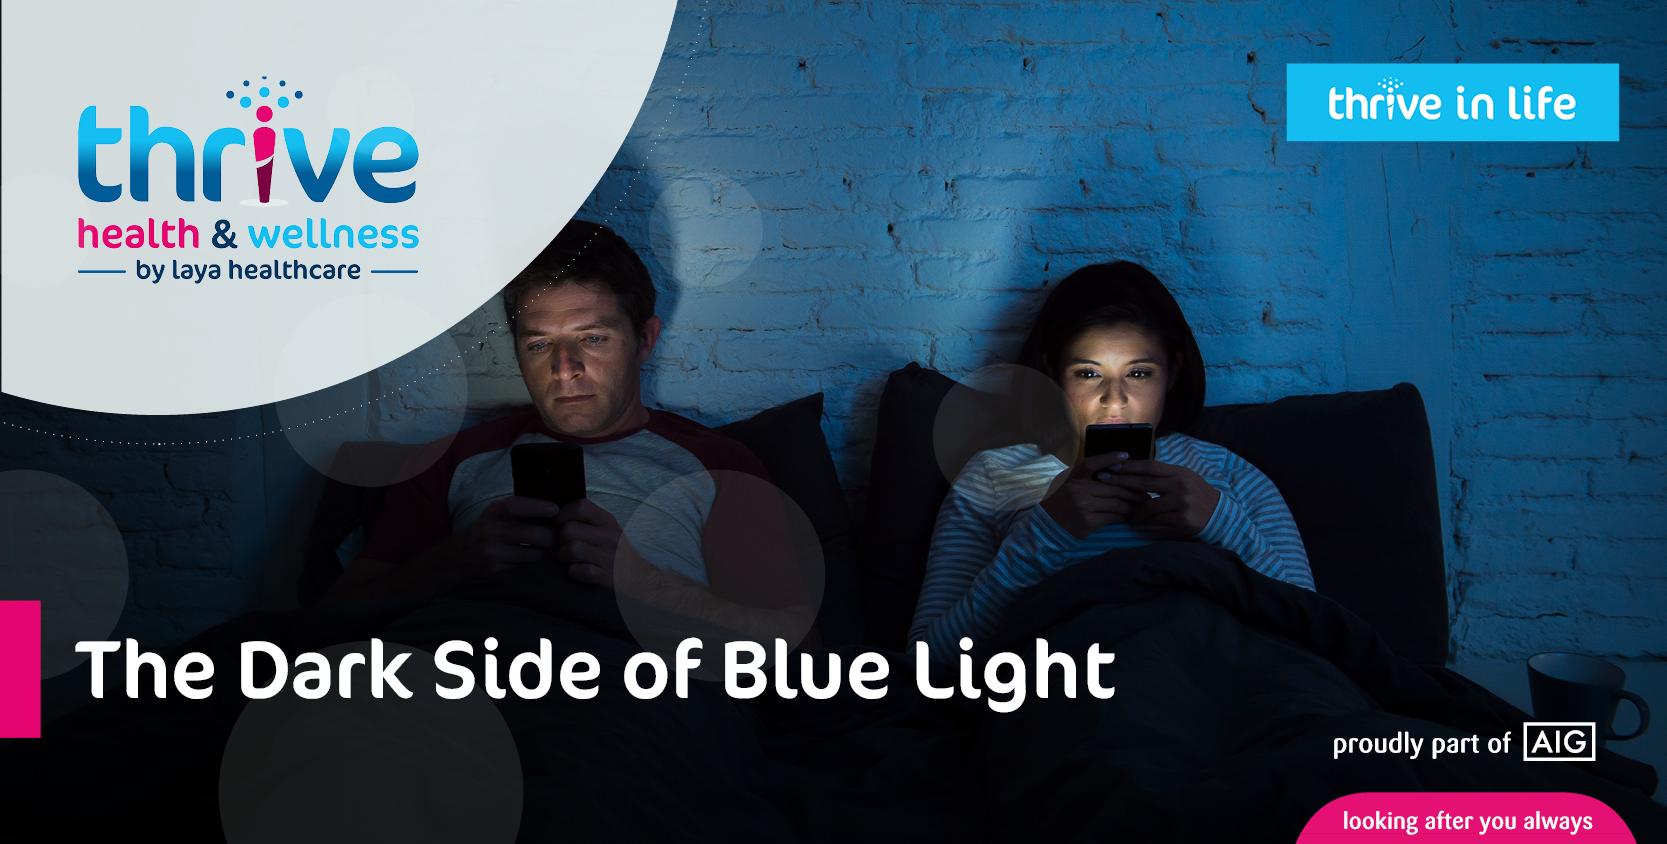 MAILCHIMP TEMPLATE. The Dark Side of Blue Light.jpg